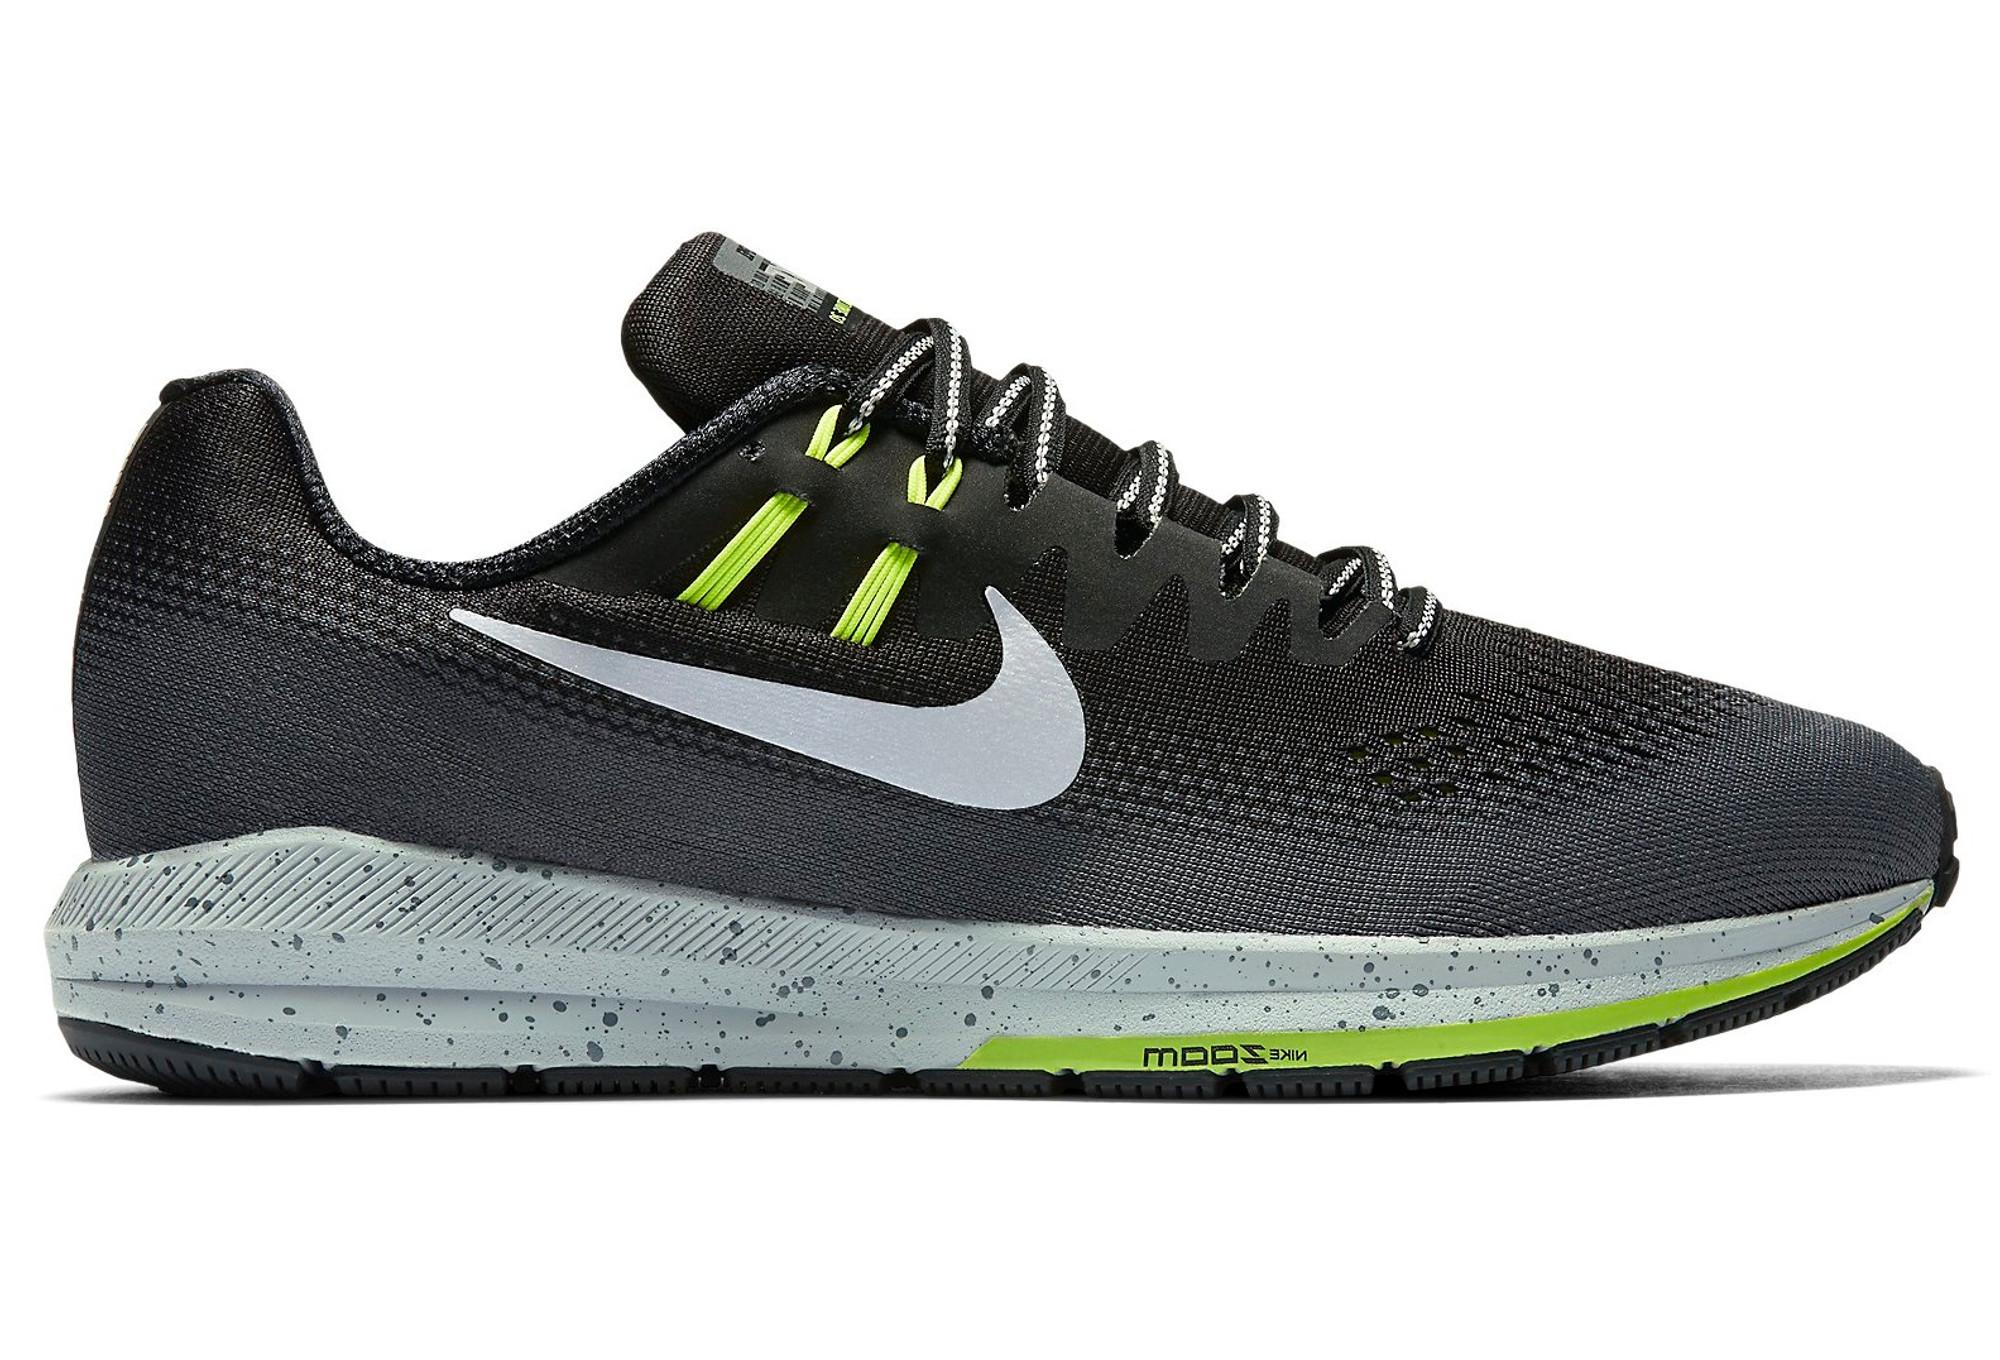 Chaussure Lescahiersdalter Running Durée Nike De Vie QCoErdexBW